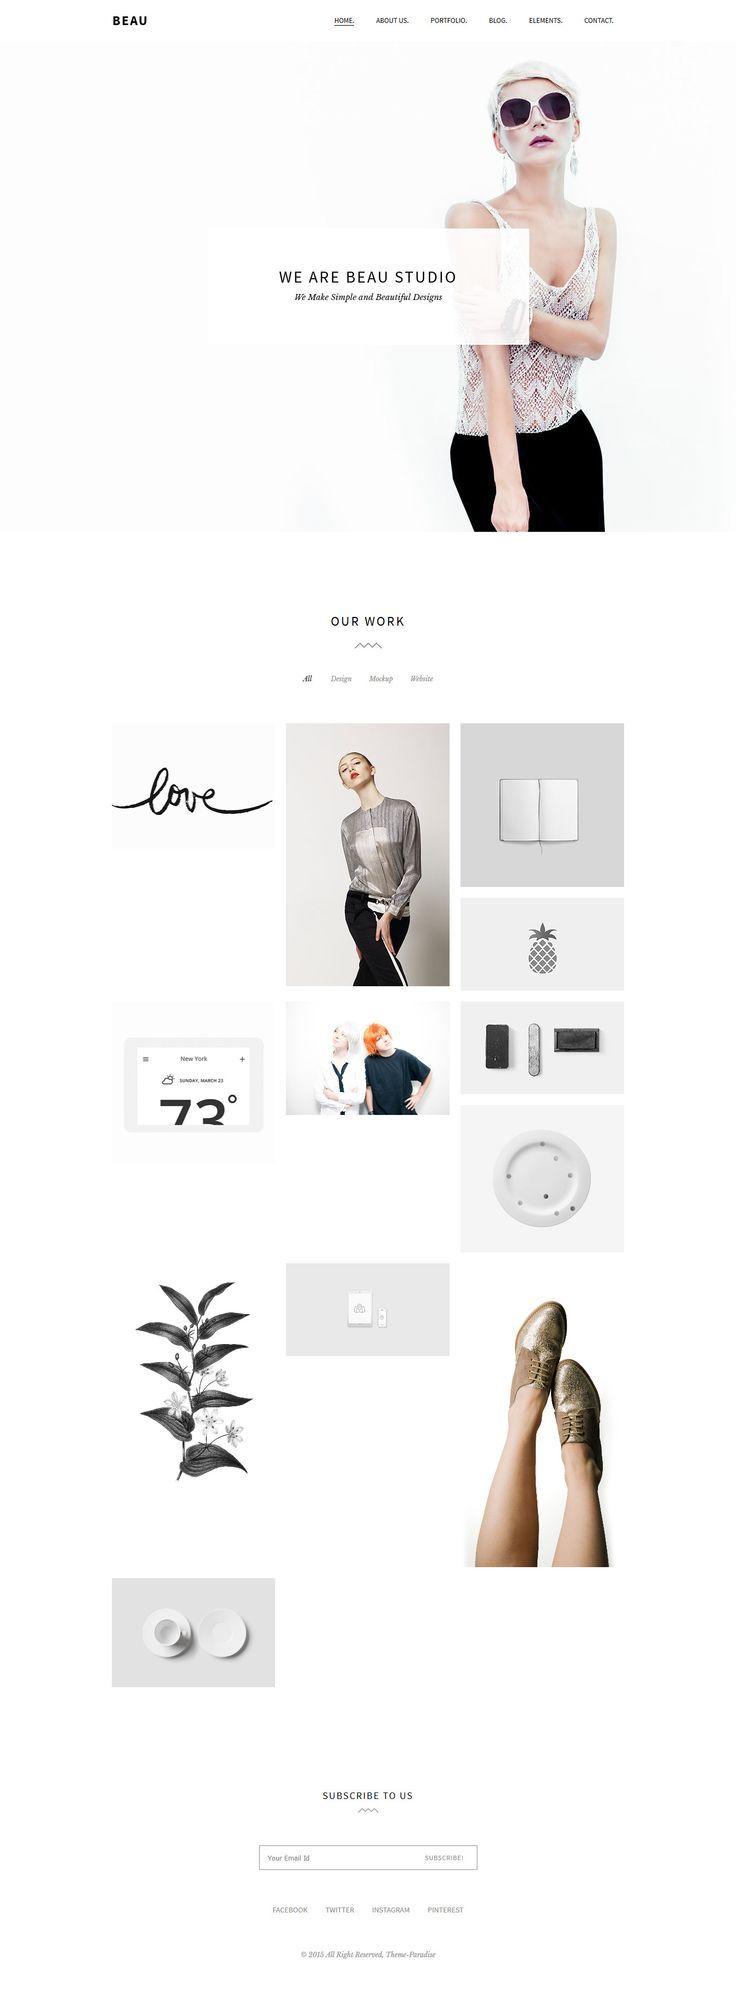 Beau - Minimal Portfolio/Agency WordPress Theme #webdesign Download: themeforest.net/...